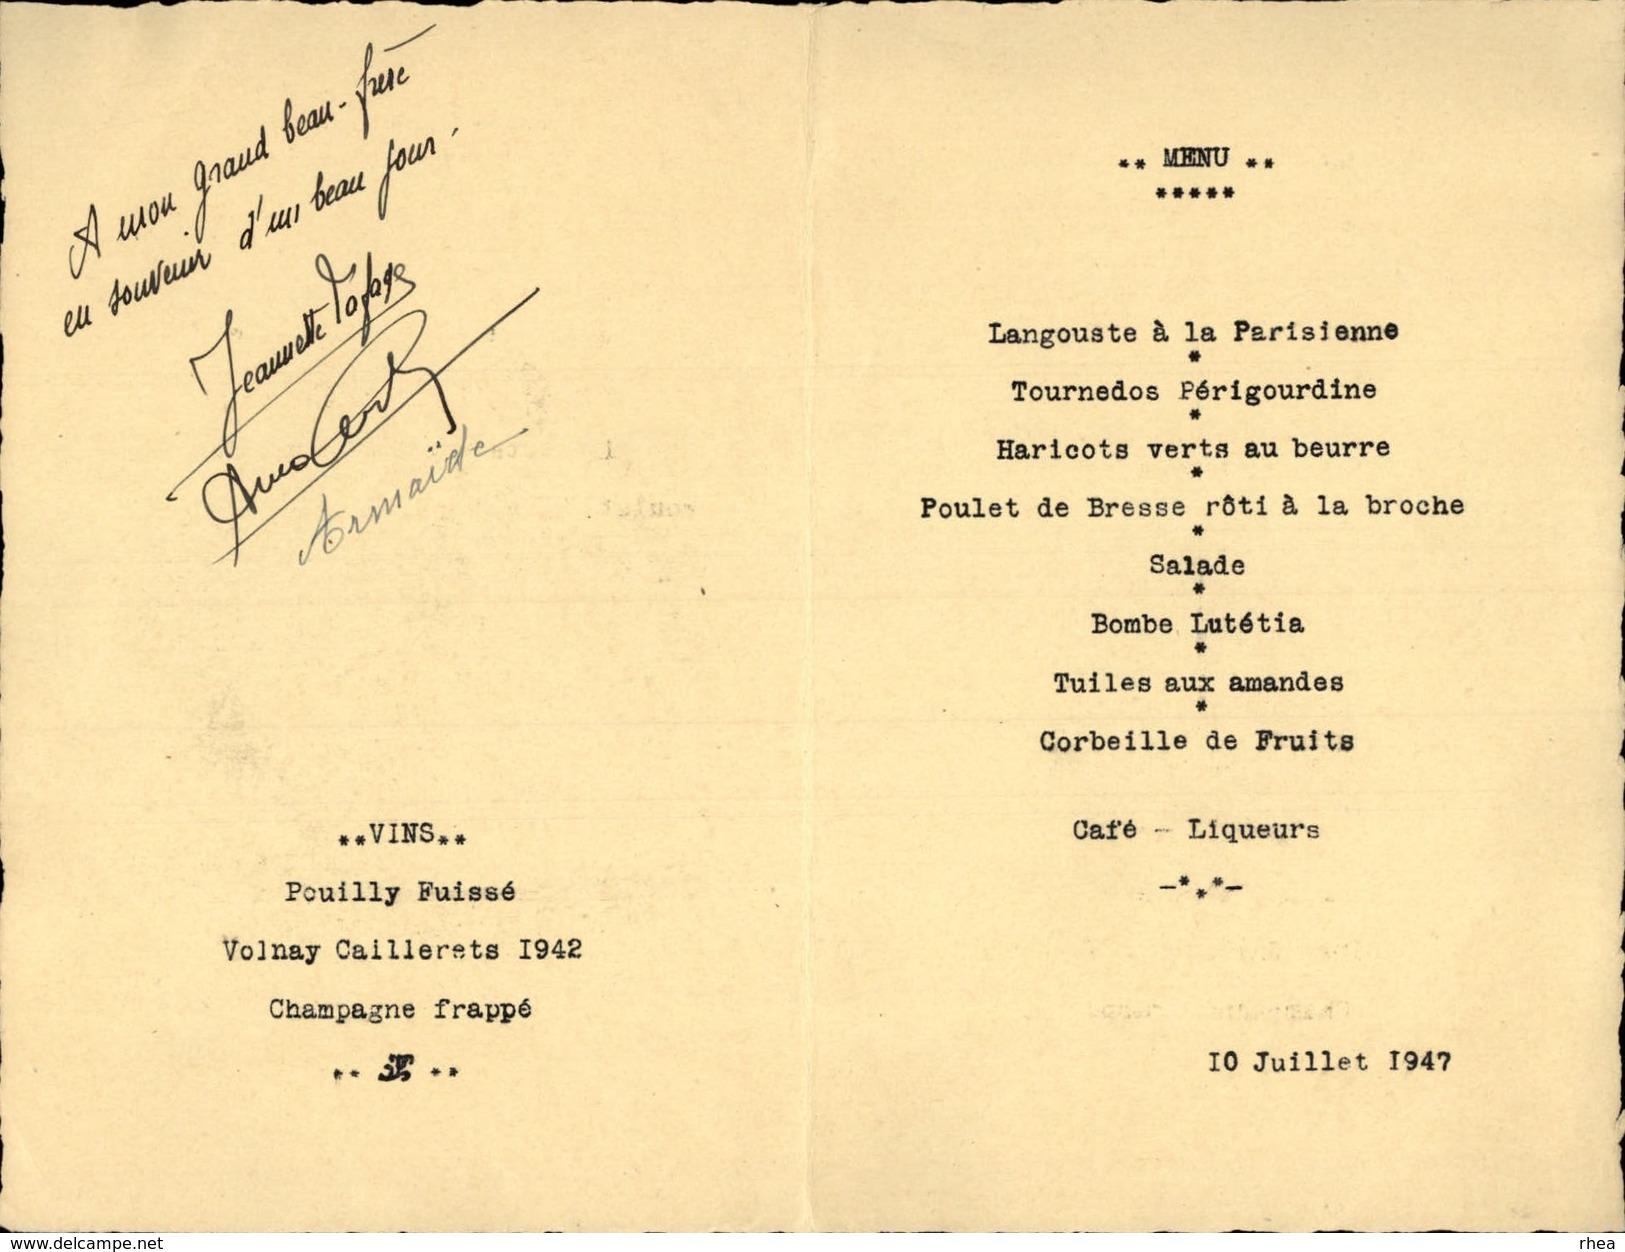 75 - PARIS - MENU - Hotel Lutetia - 1947 - Menus